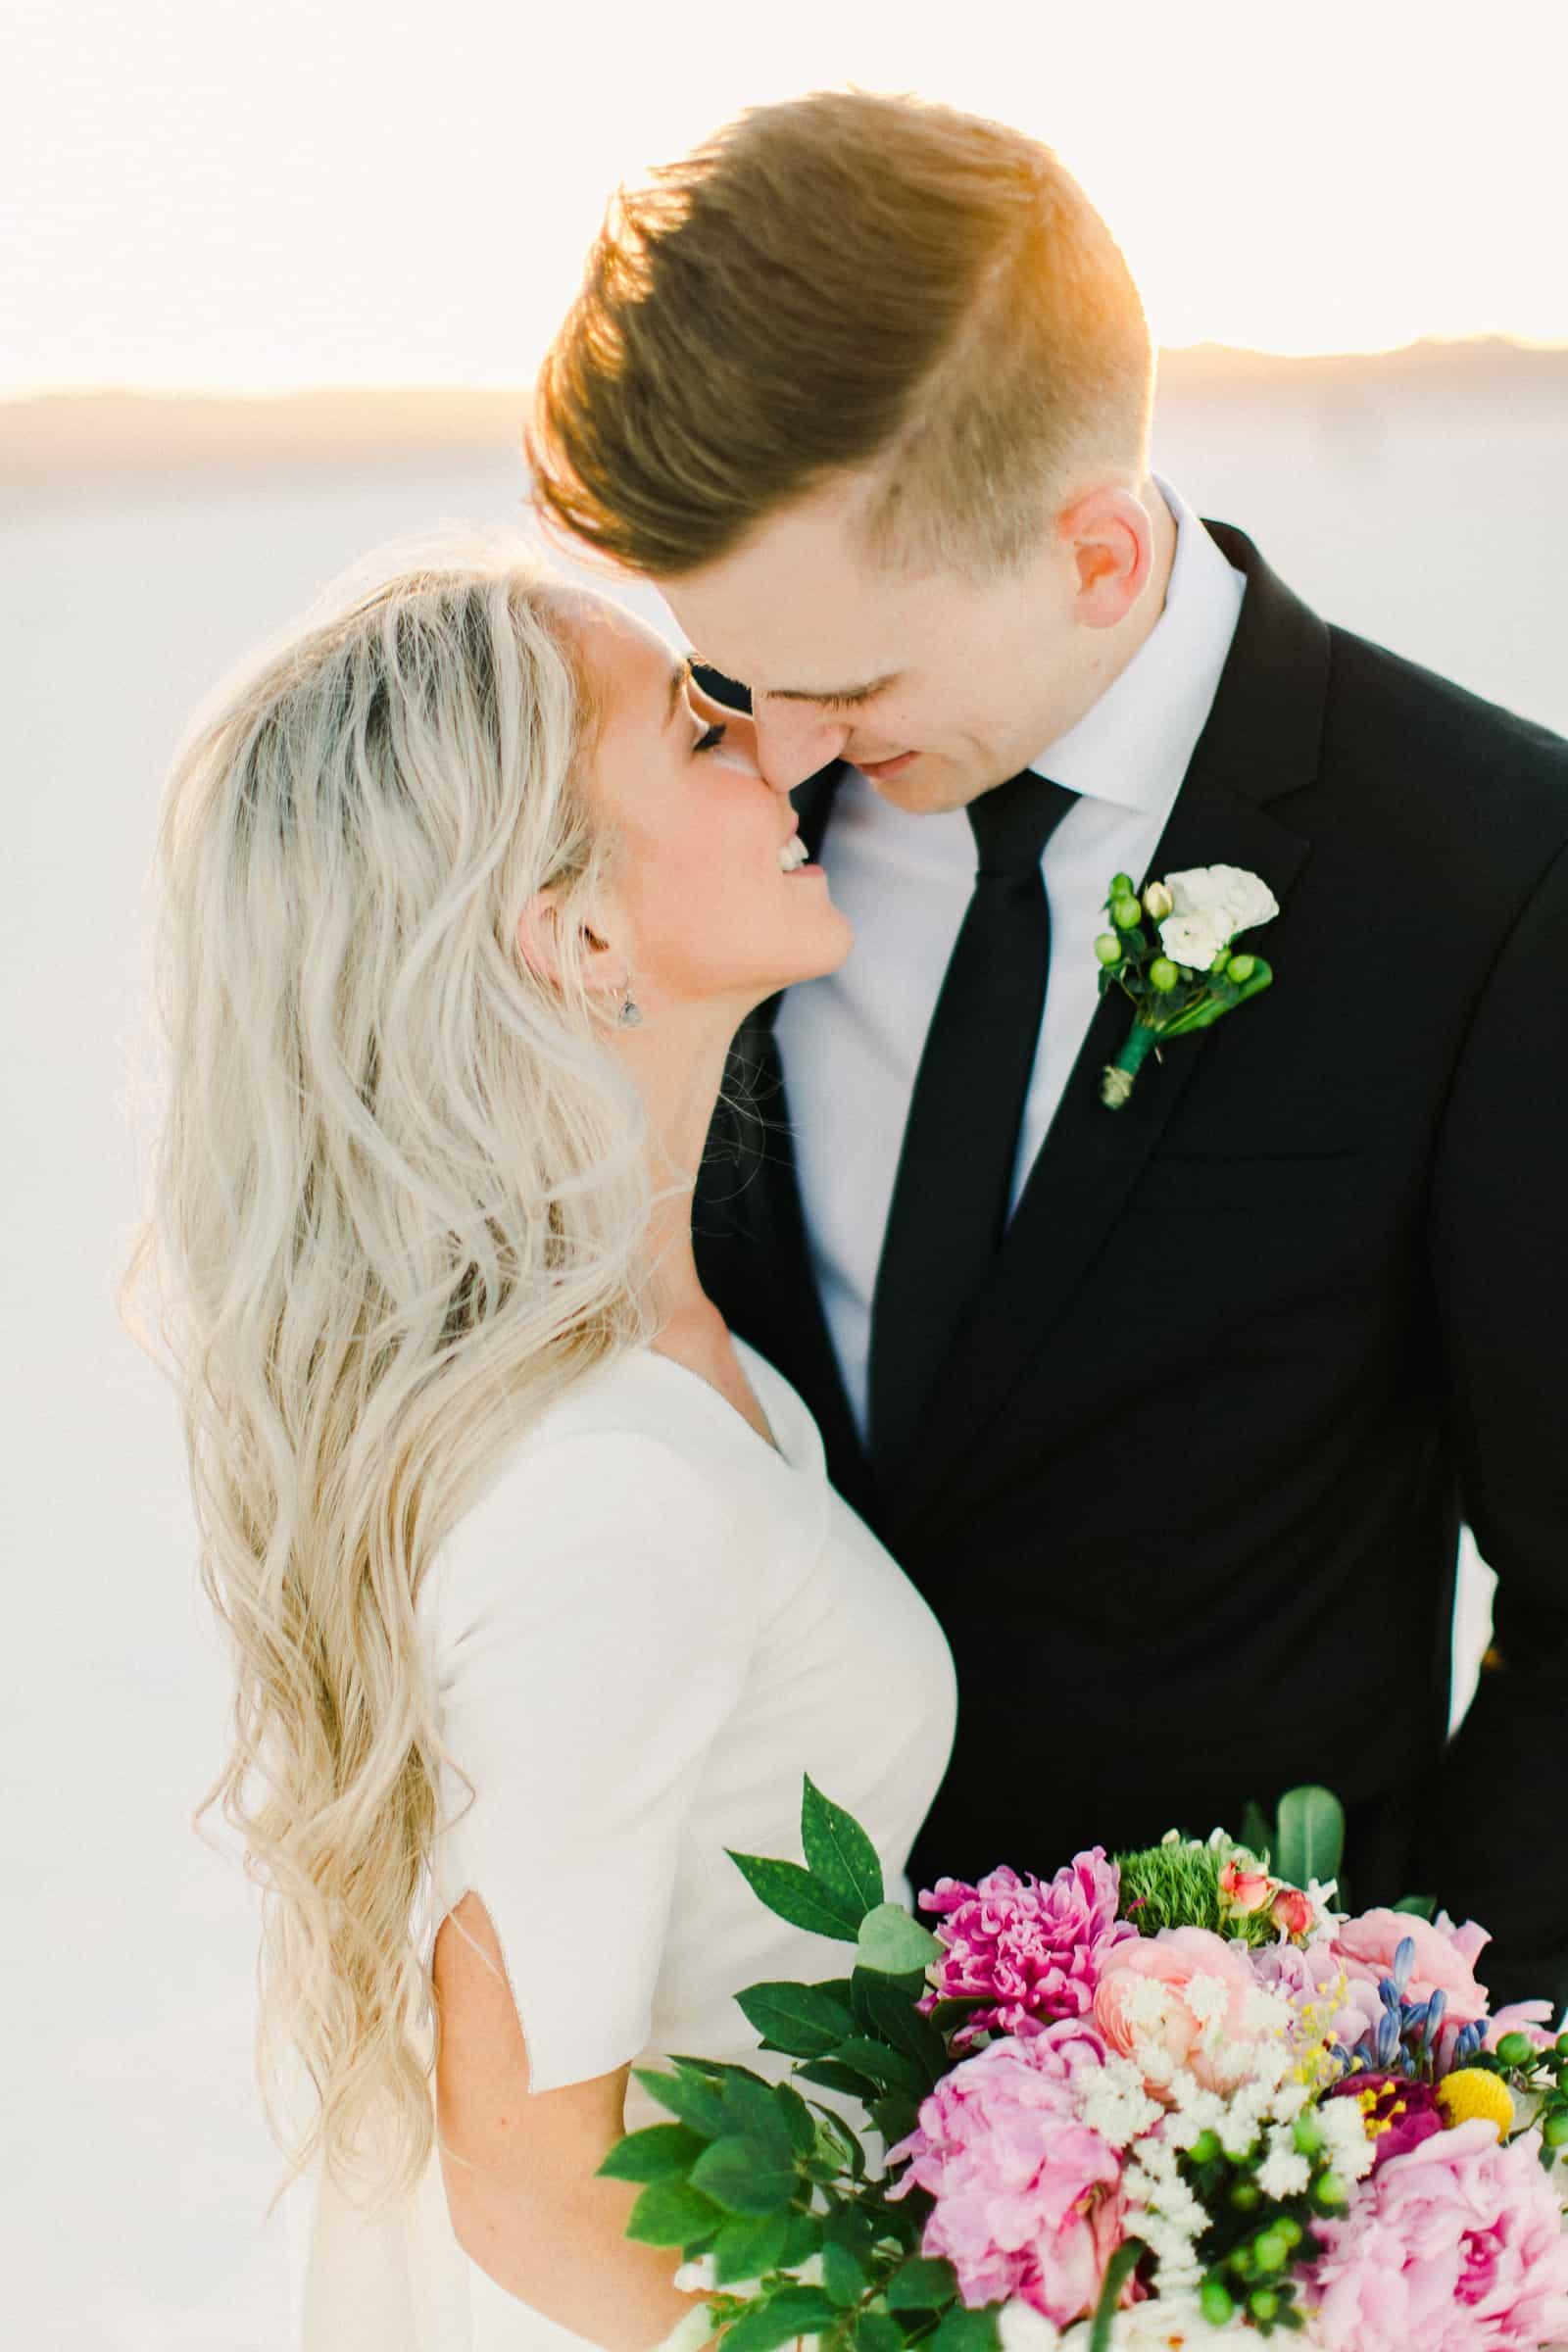 Bonneville Salt Flats Utah Wedding Photography, destination wedding, bride and groom first kiss